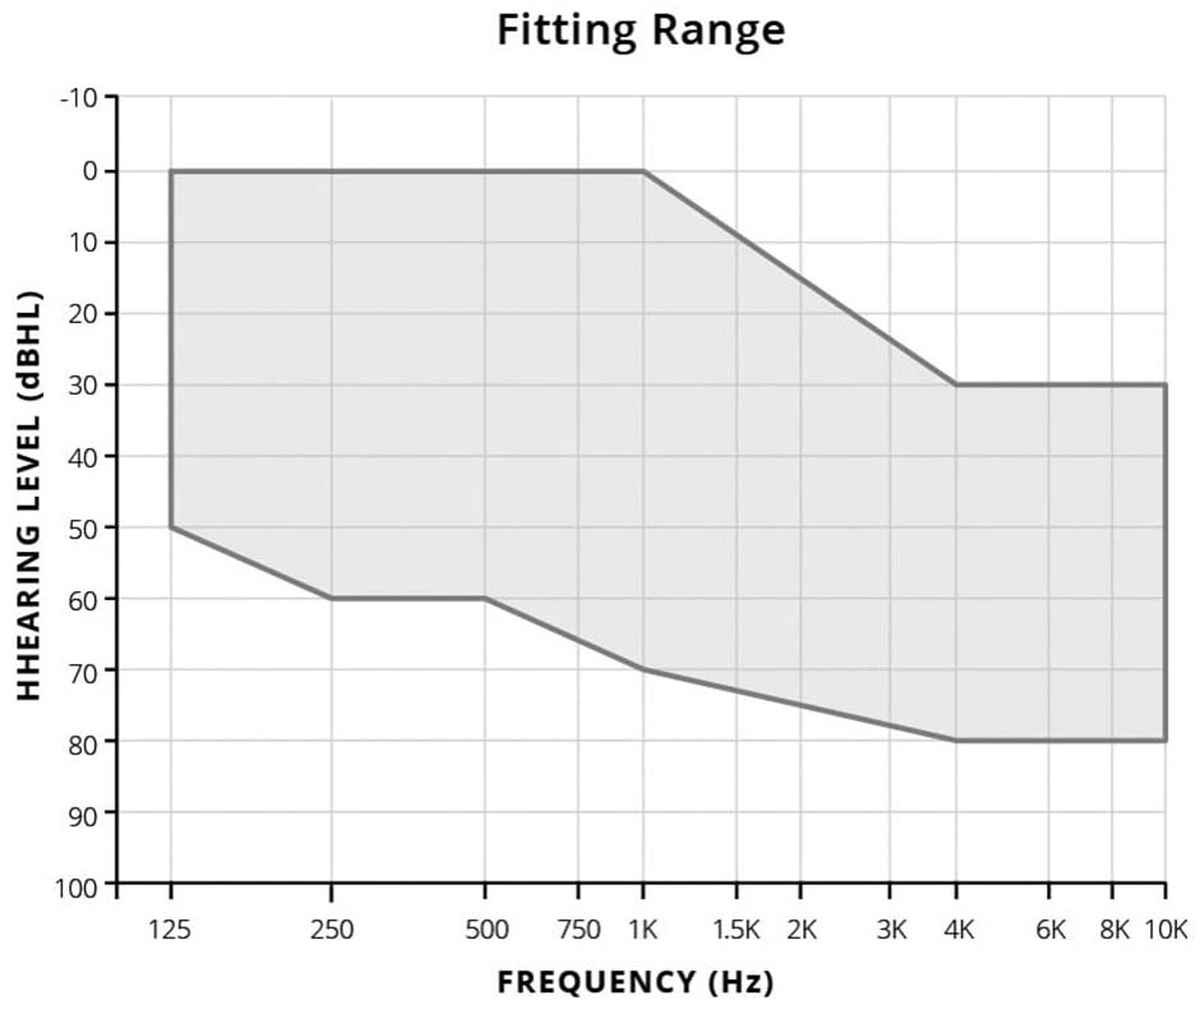 Fitting Range